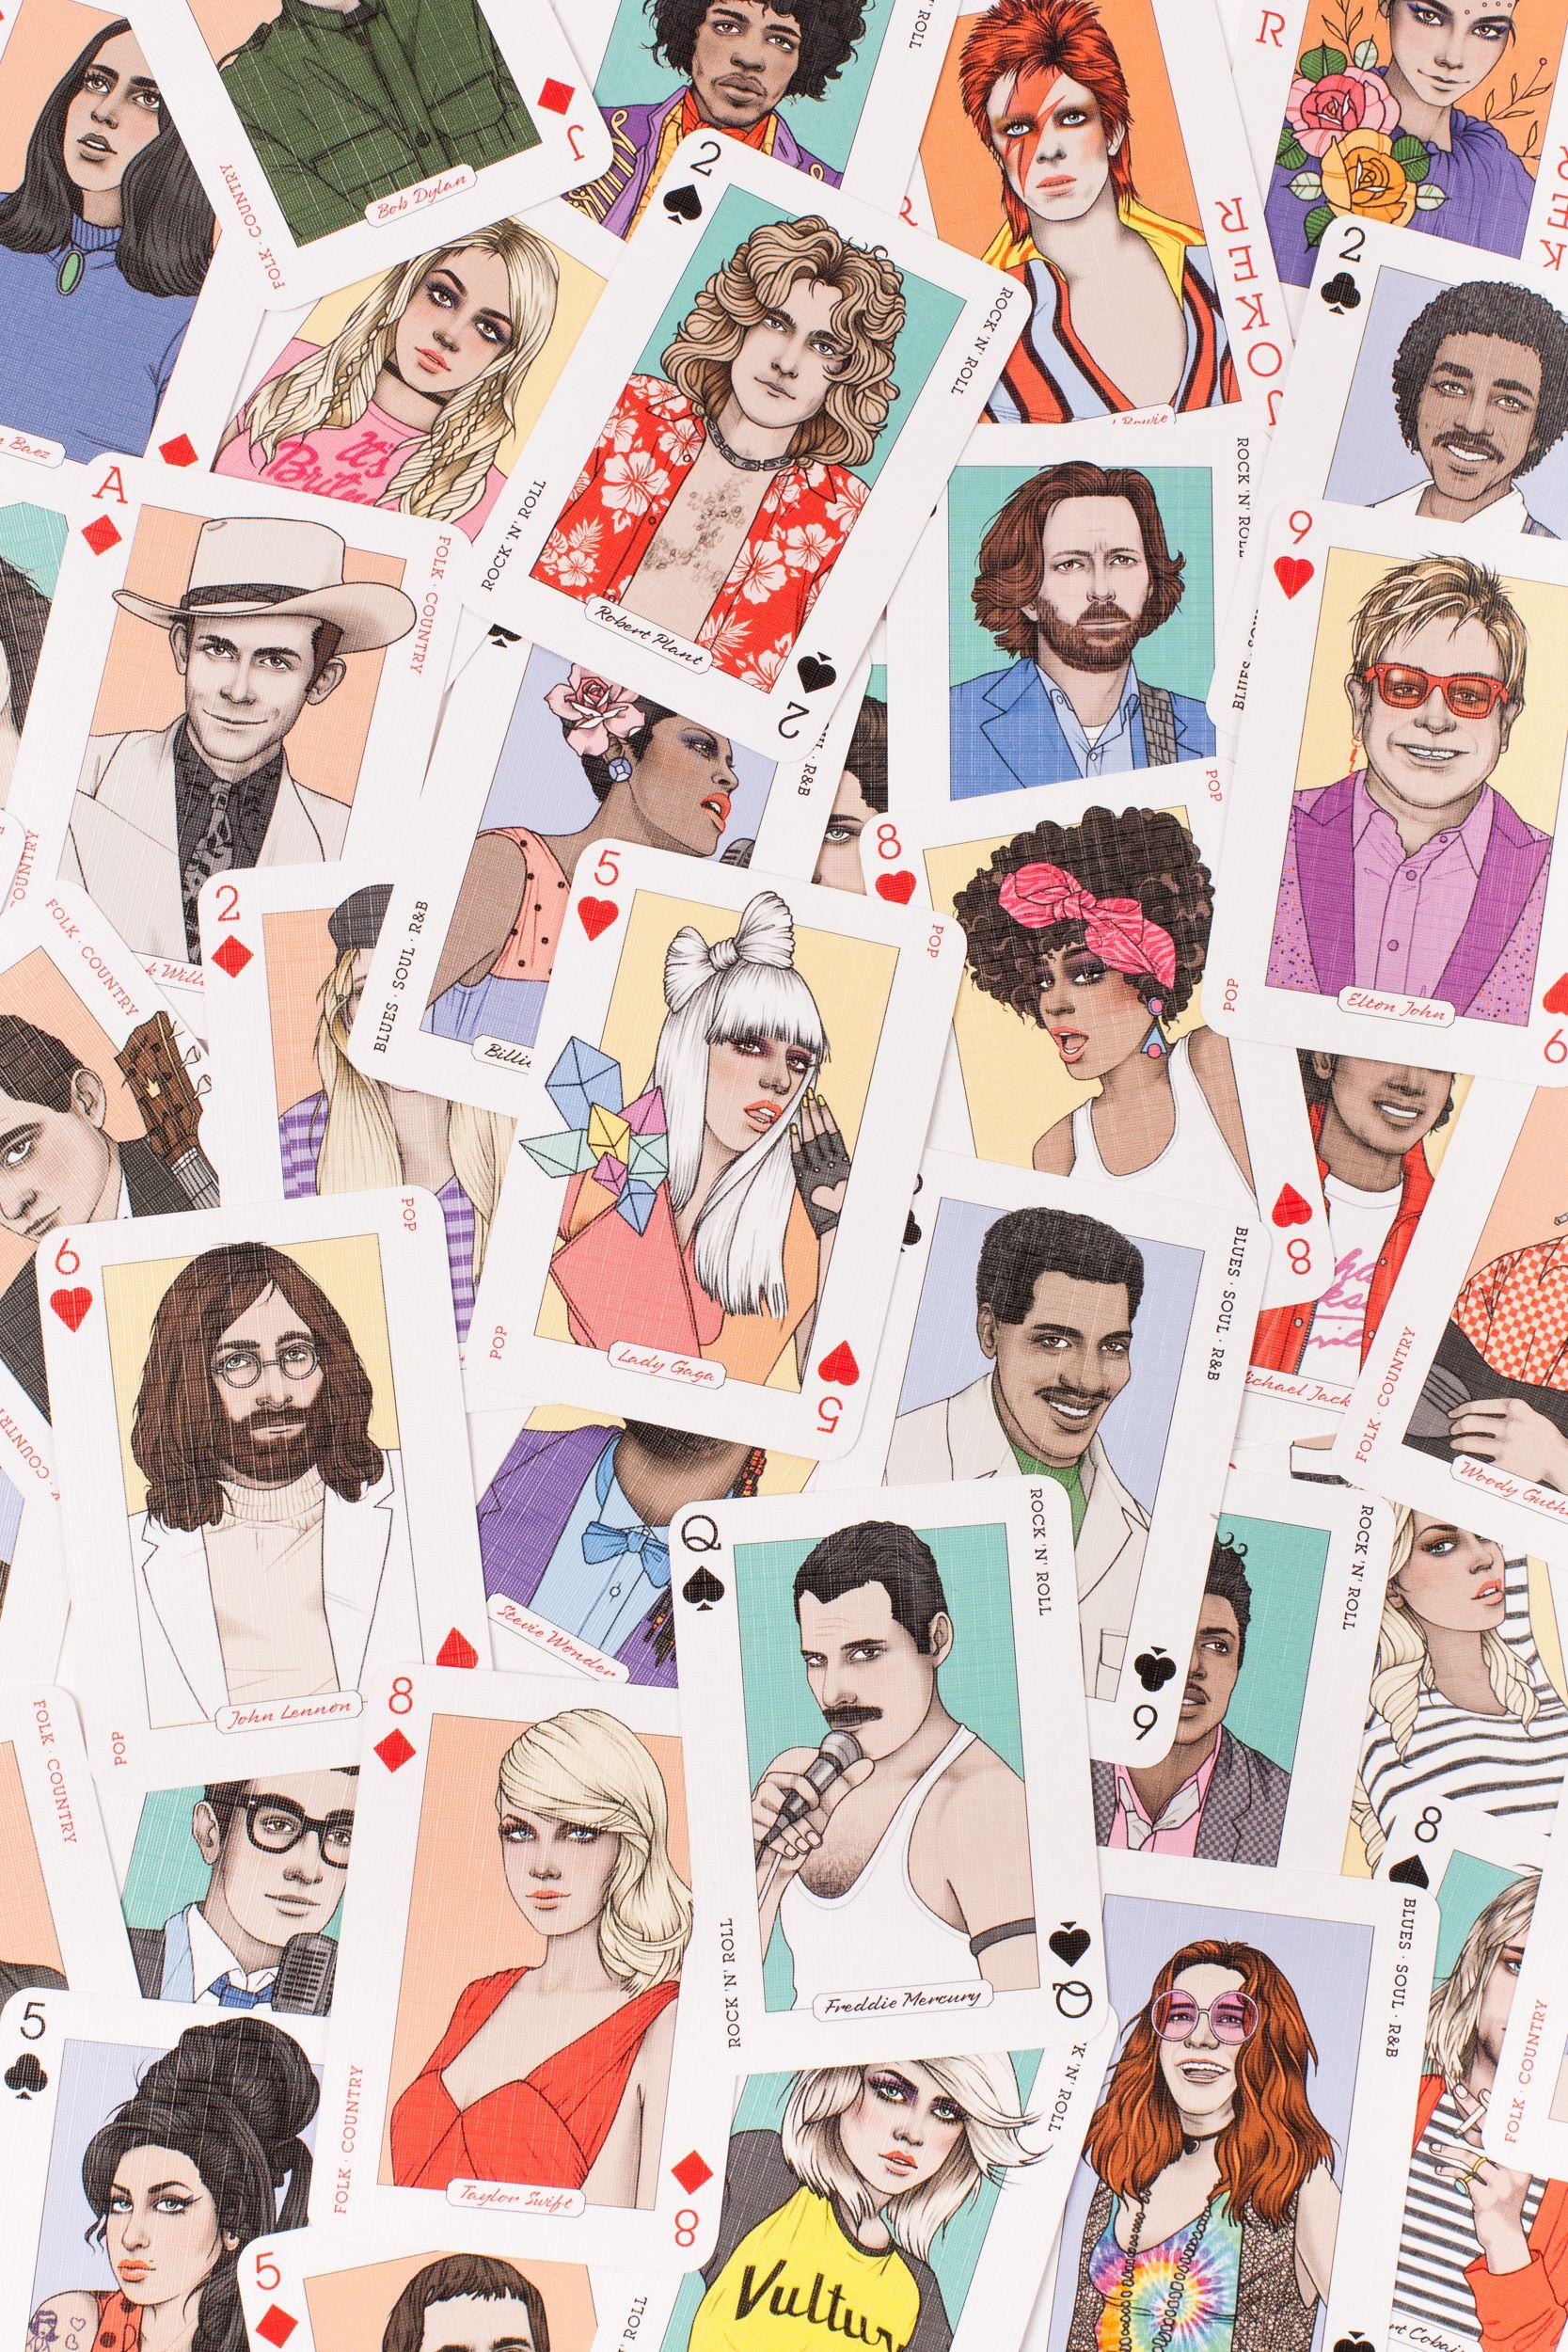 Music Genius Music genius, Playing cards, Music lovers